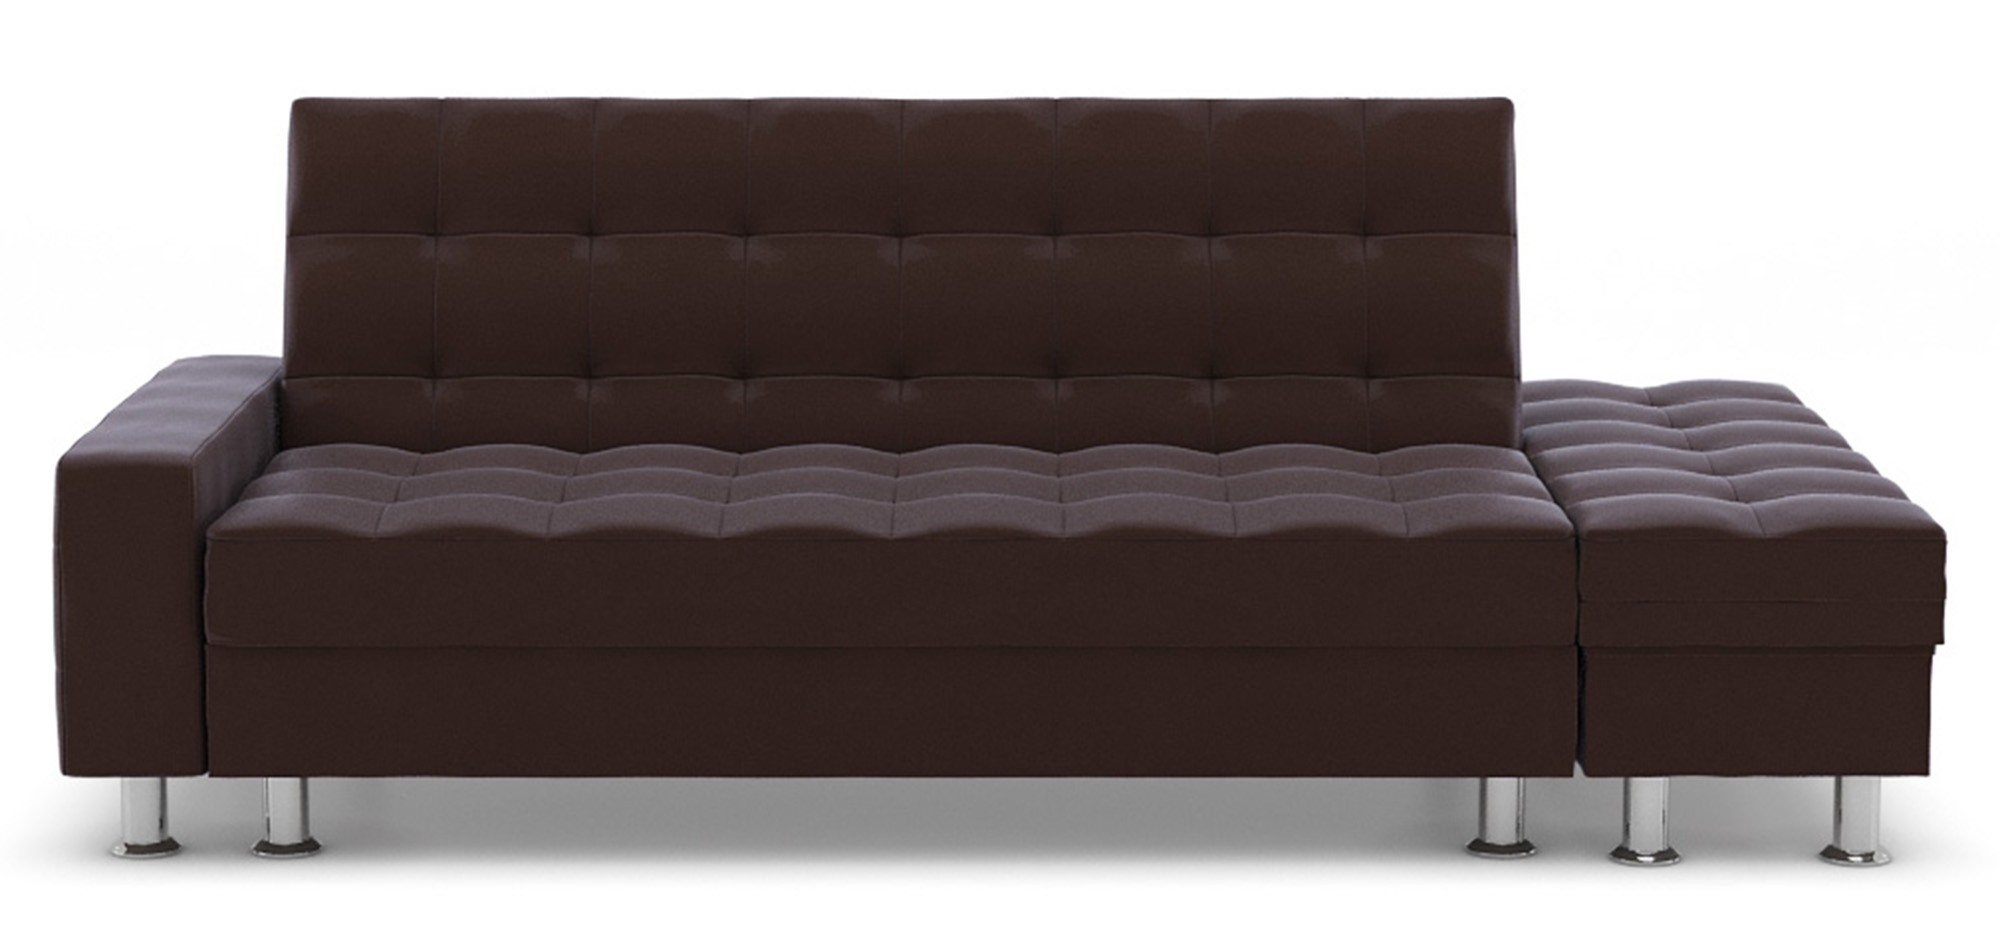 Thora Multi Storage Sofa Bed Pvc